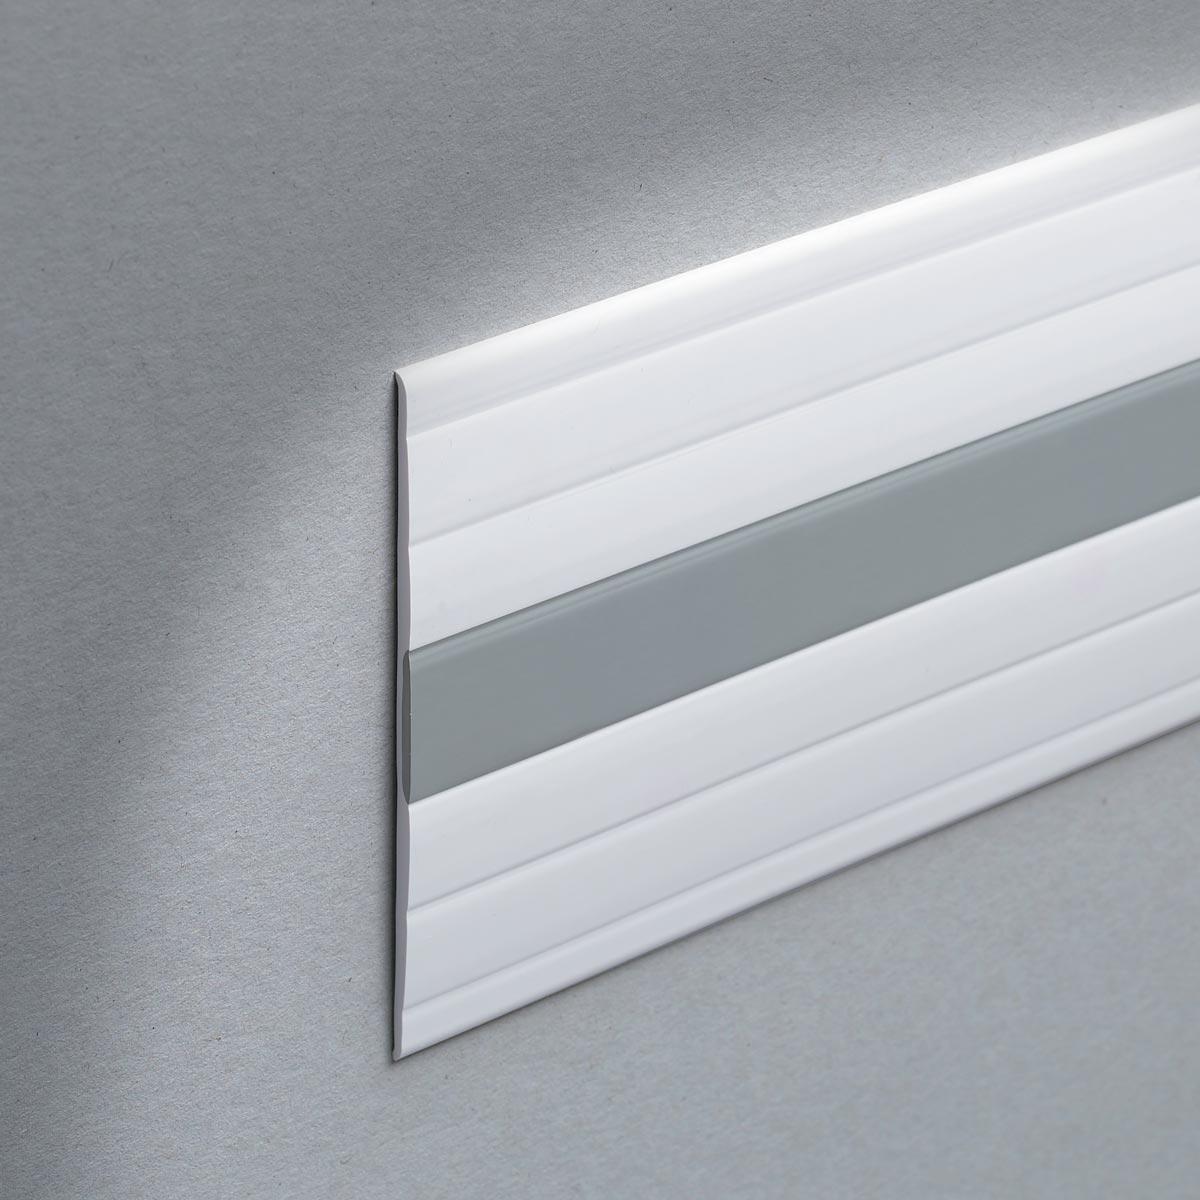 Profili per rivestimenti Wallprotection WP 60 P11 P22 Profilitec